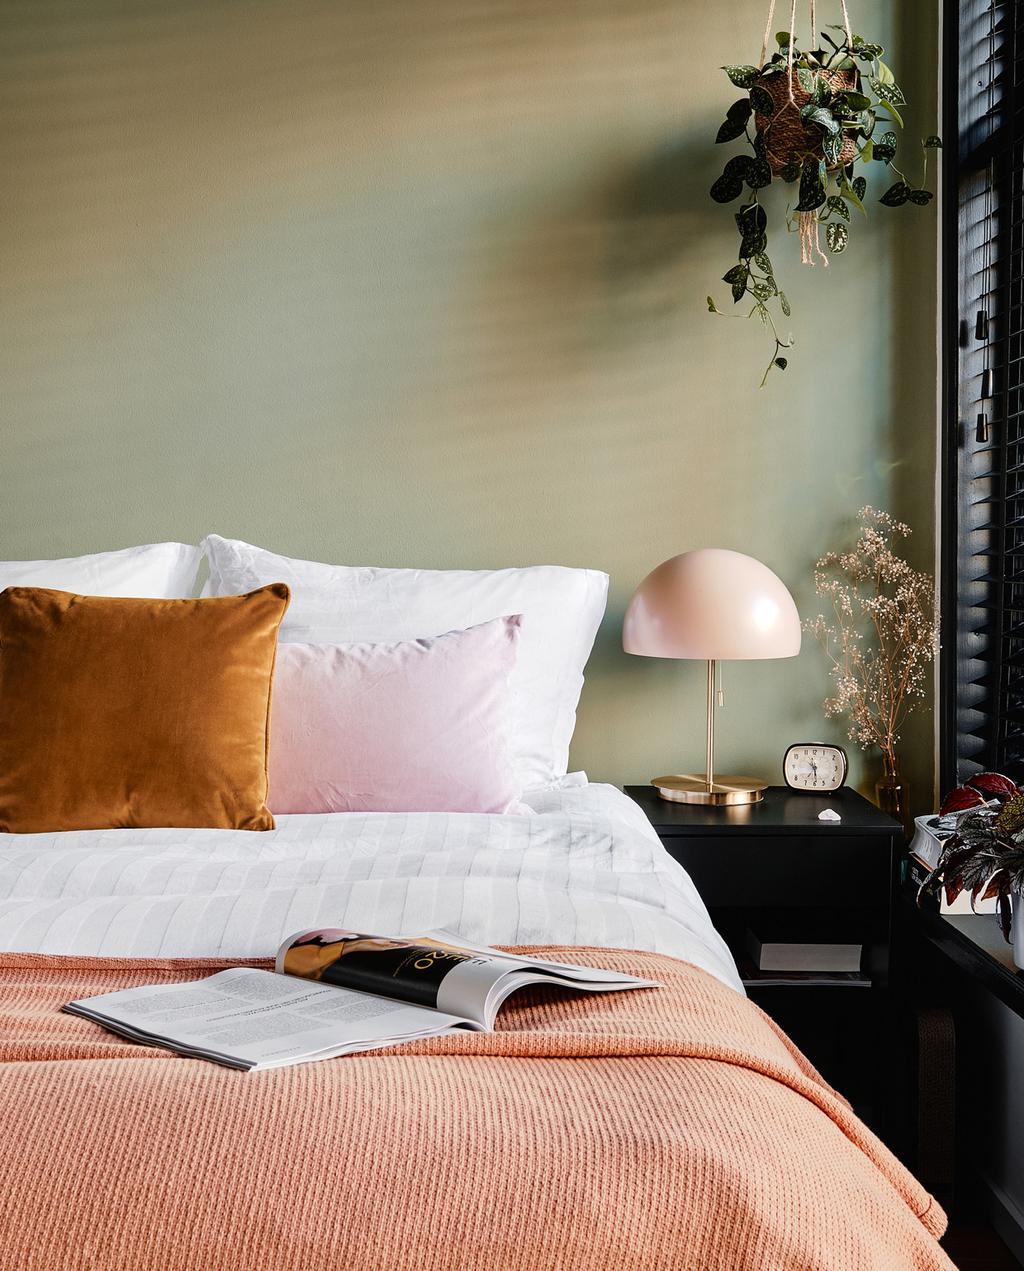 Groene muur | roze dekbedovertrek | lamp | vtwonen 02-2021 | vintage tafellampen